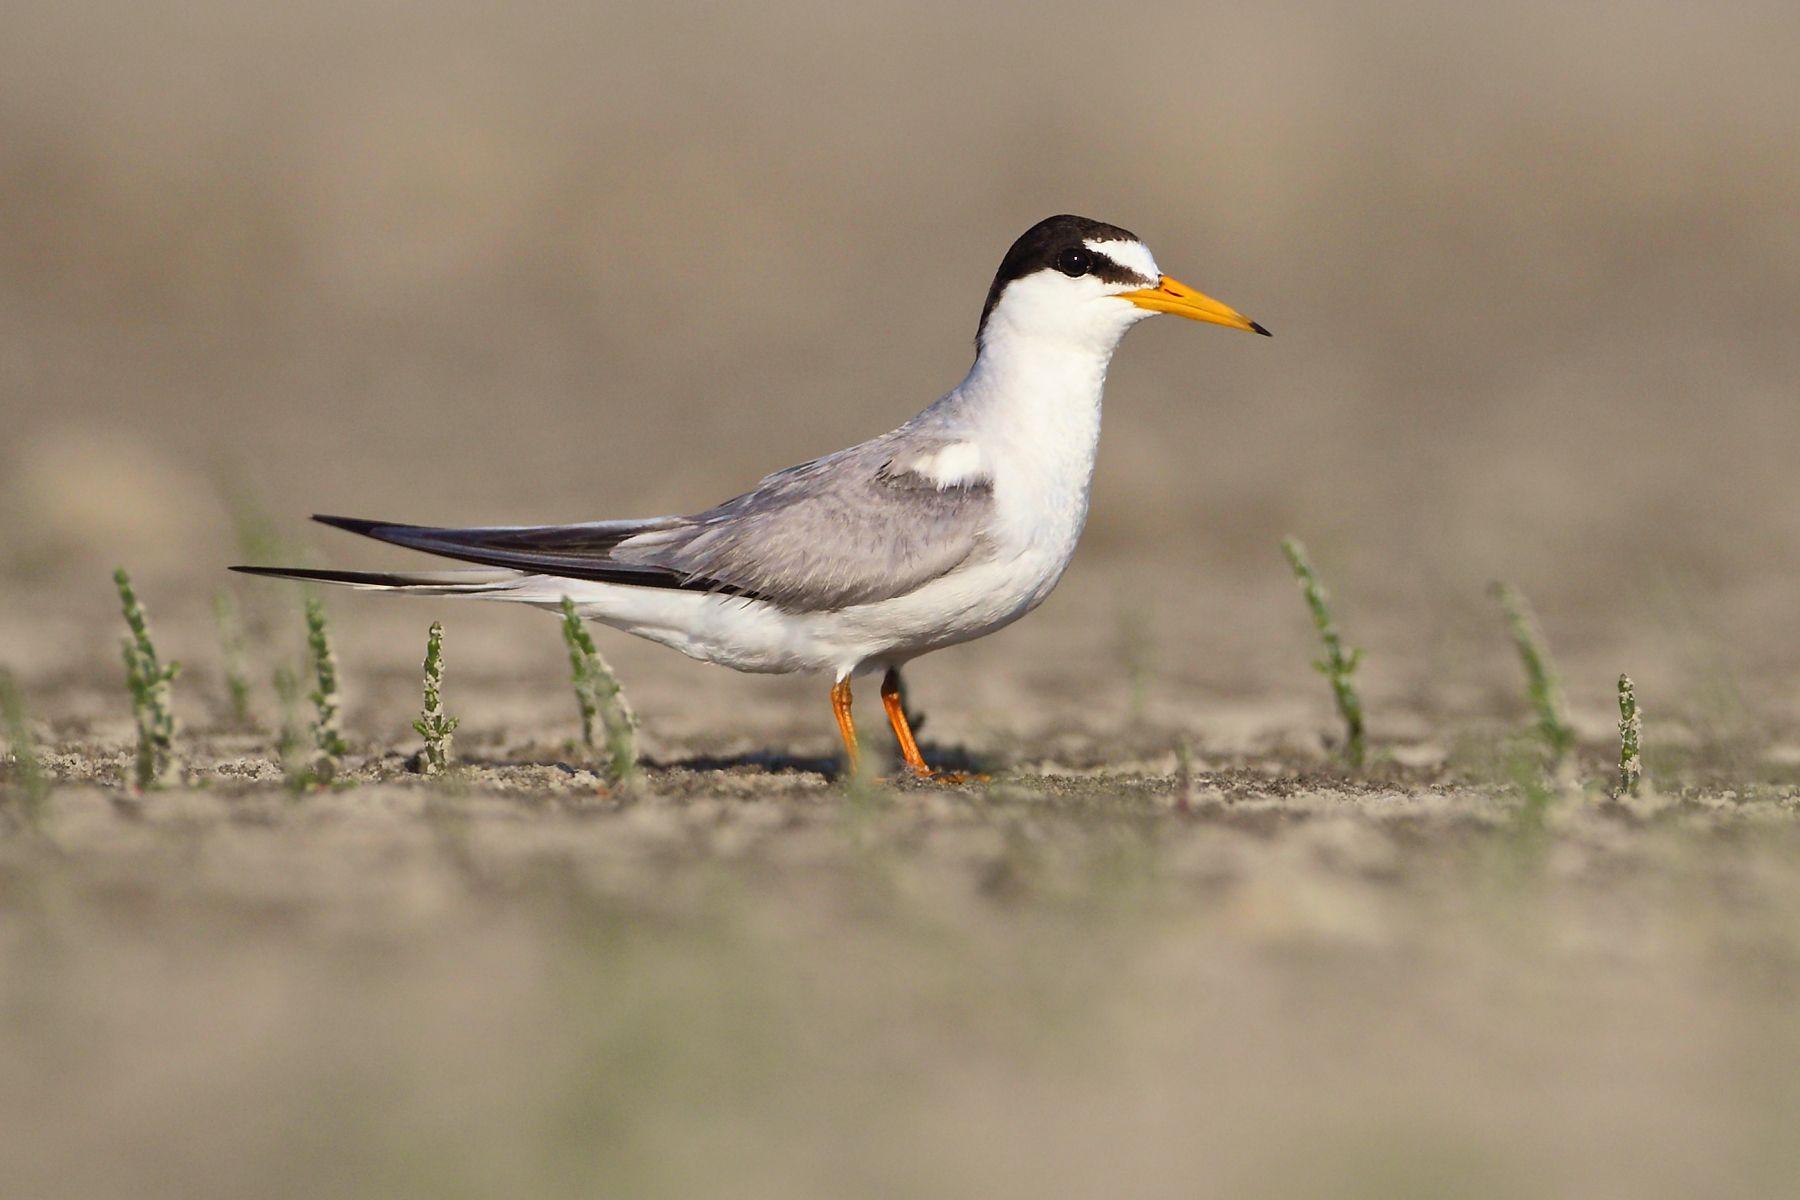 Little Tern at the Danube Delta